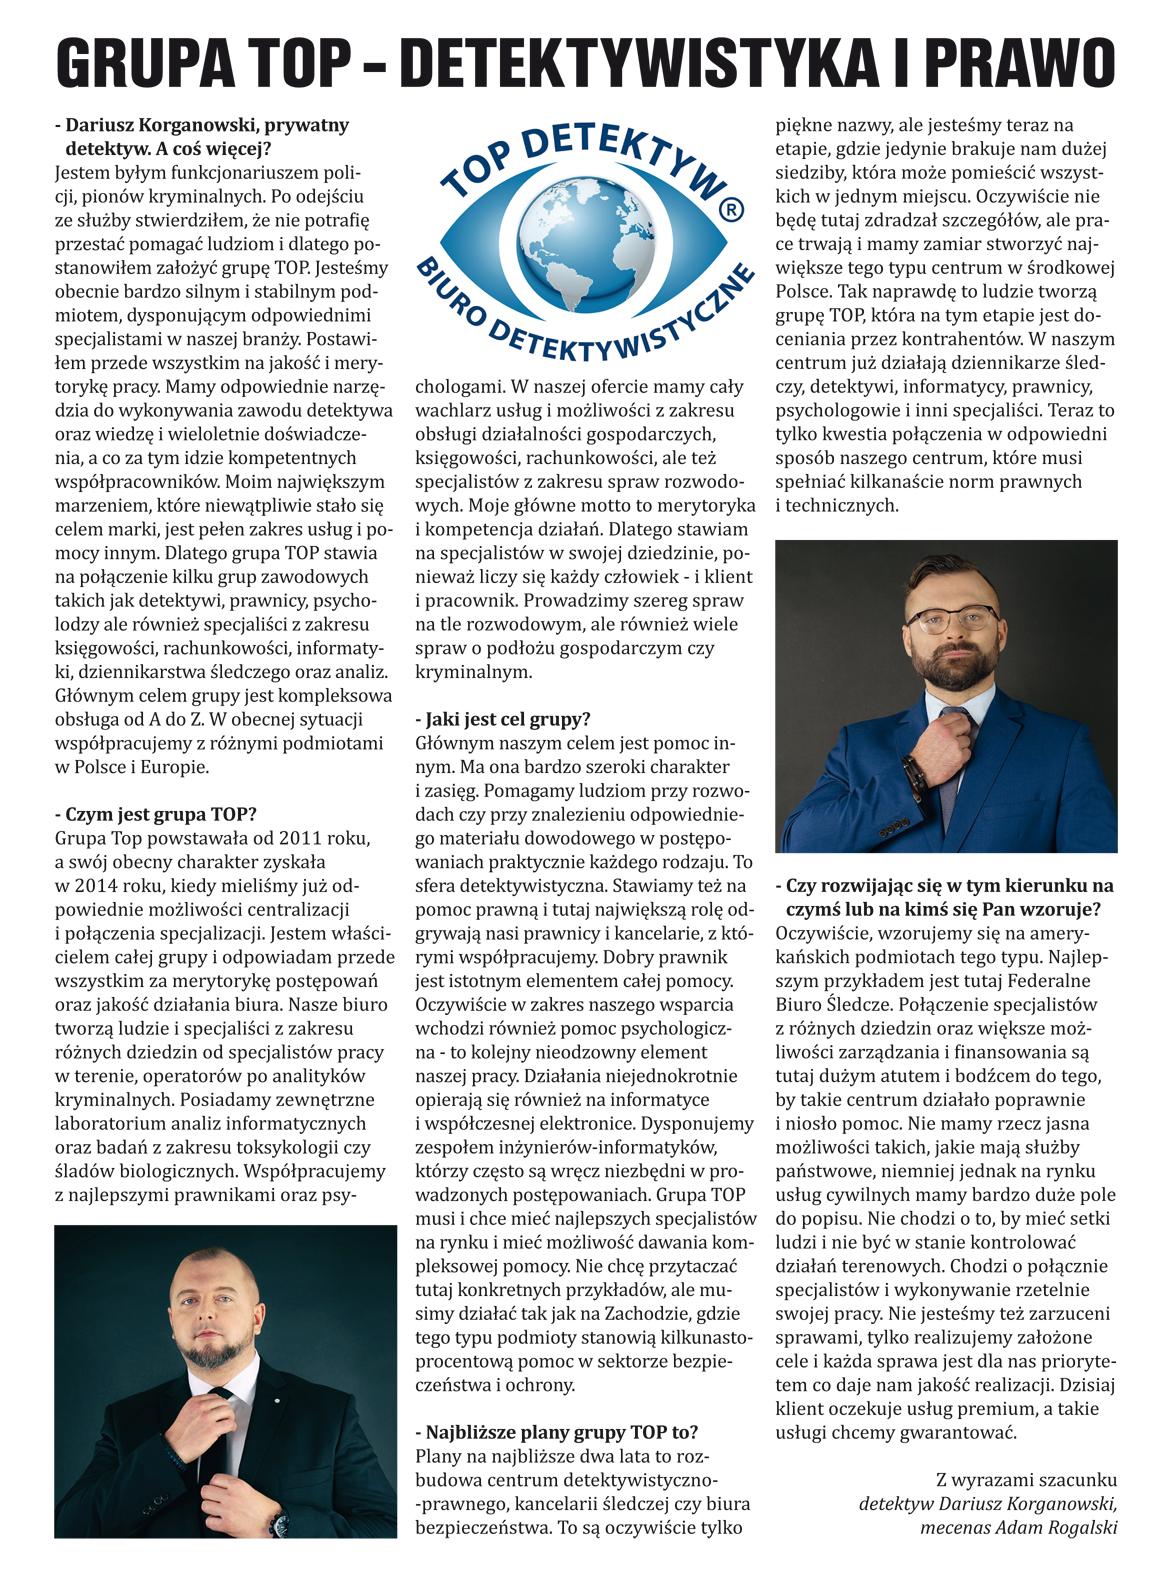 Grupa TOP – detektywistyka i prawo (gazeta)